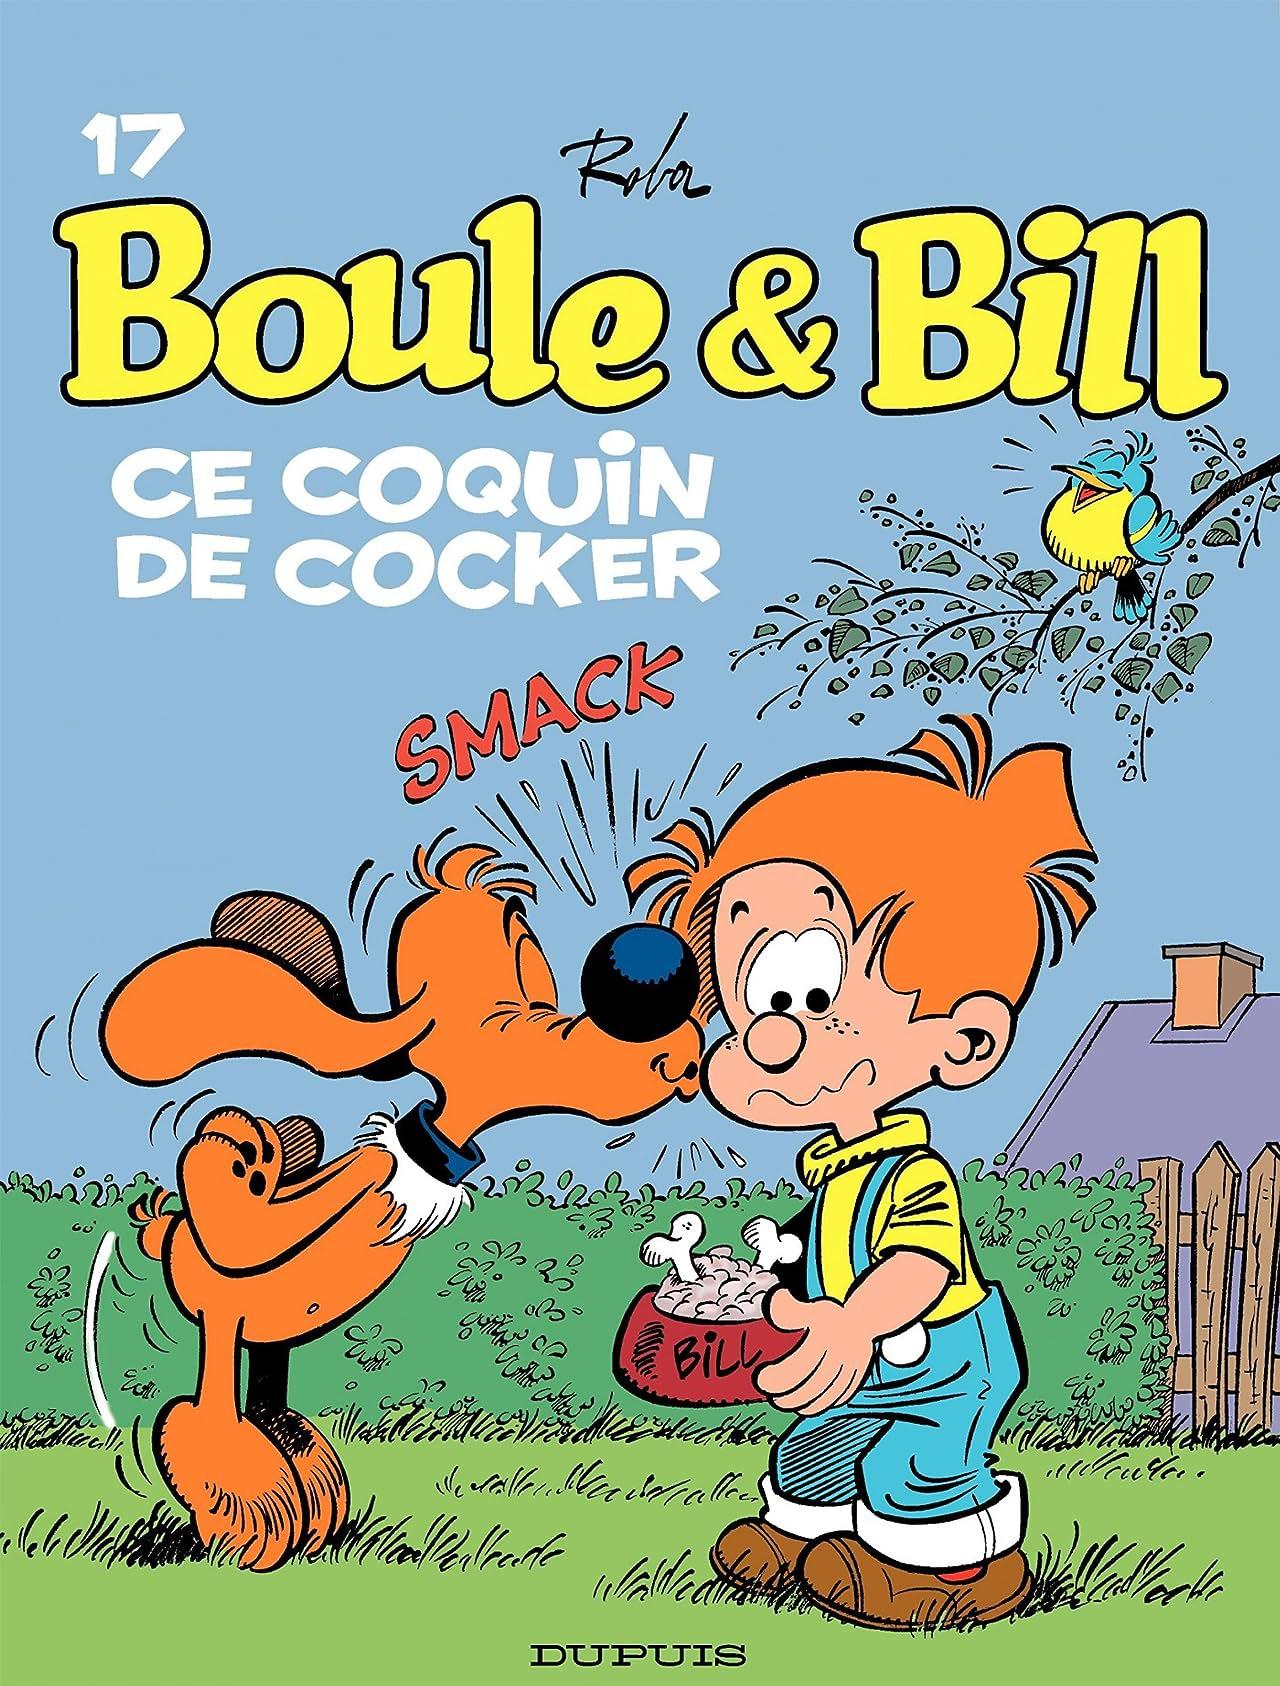 Boule et Bill Vol. 17: Ce coquin de cocker